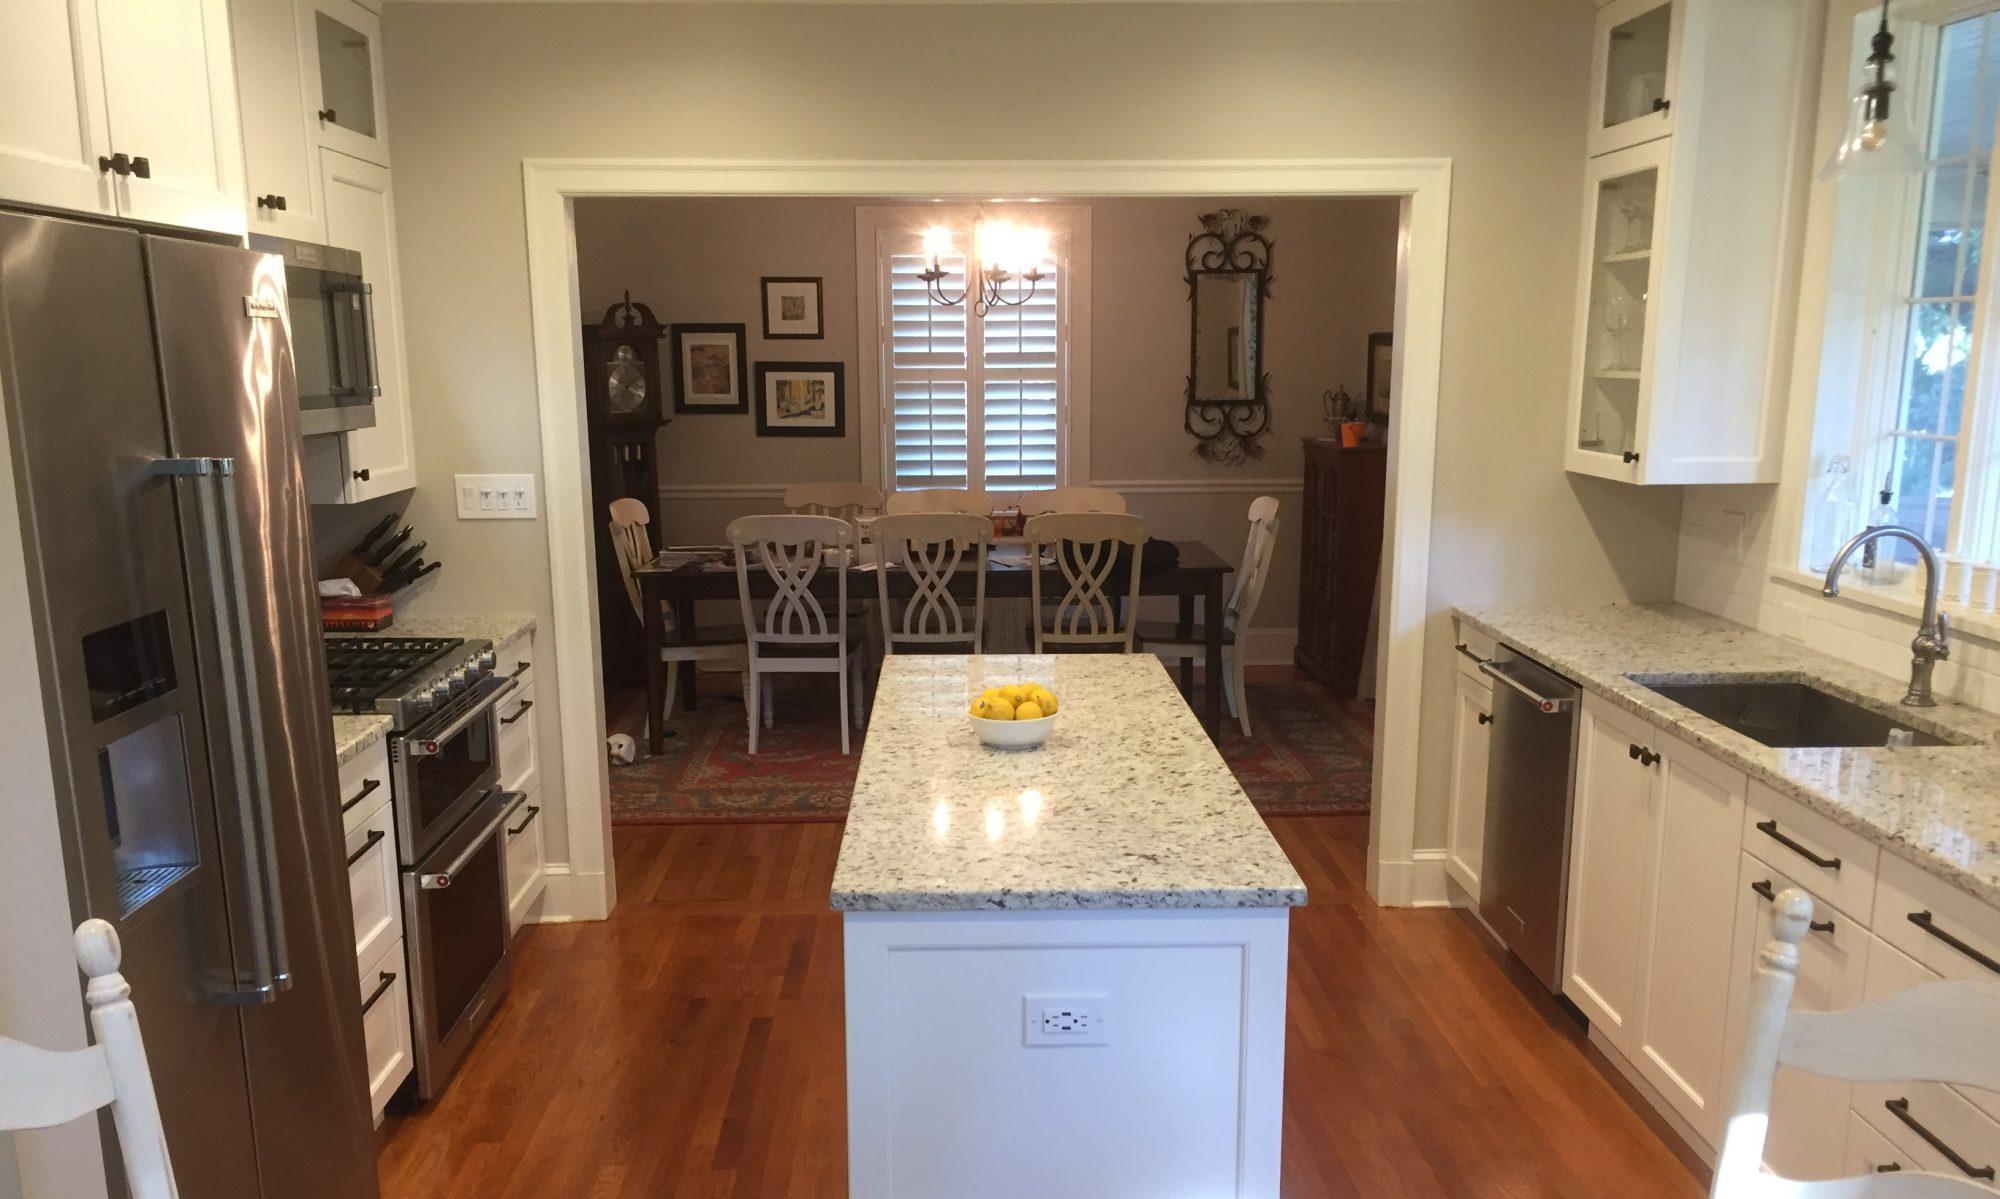 TL Drewes Home Improvement & Repair